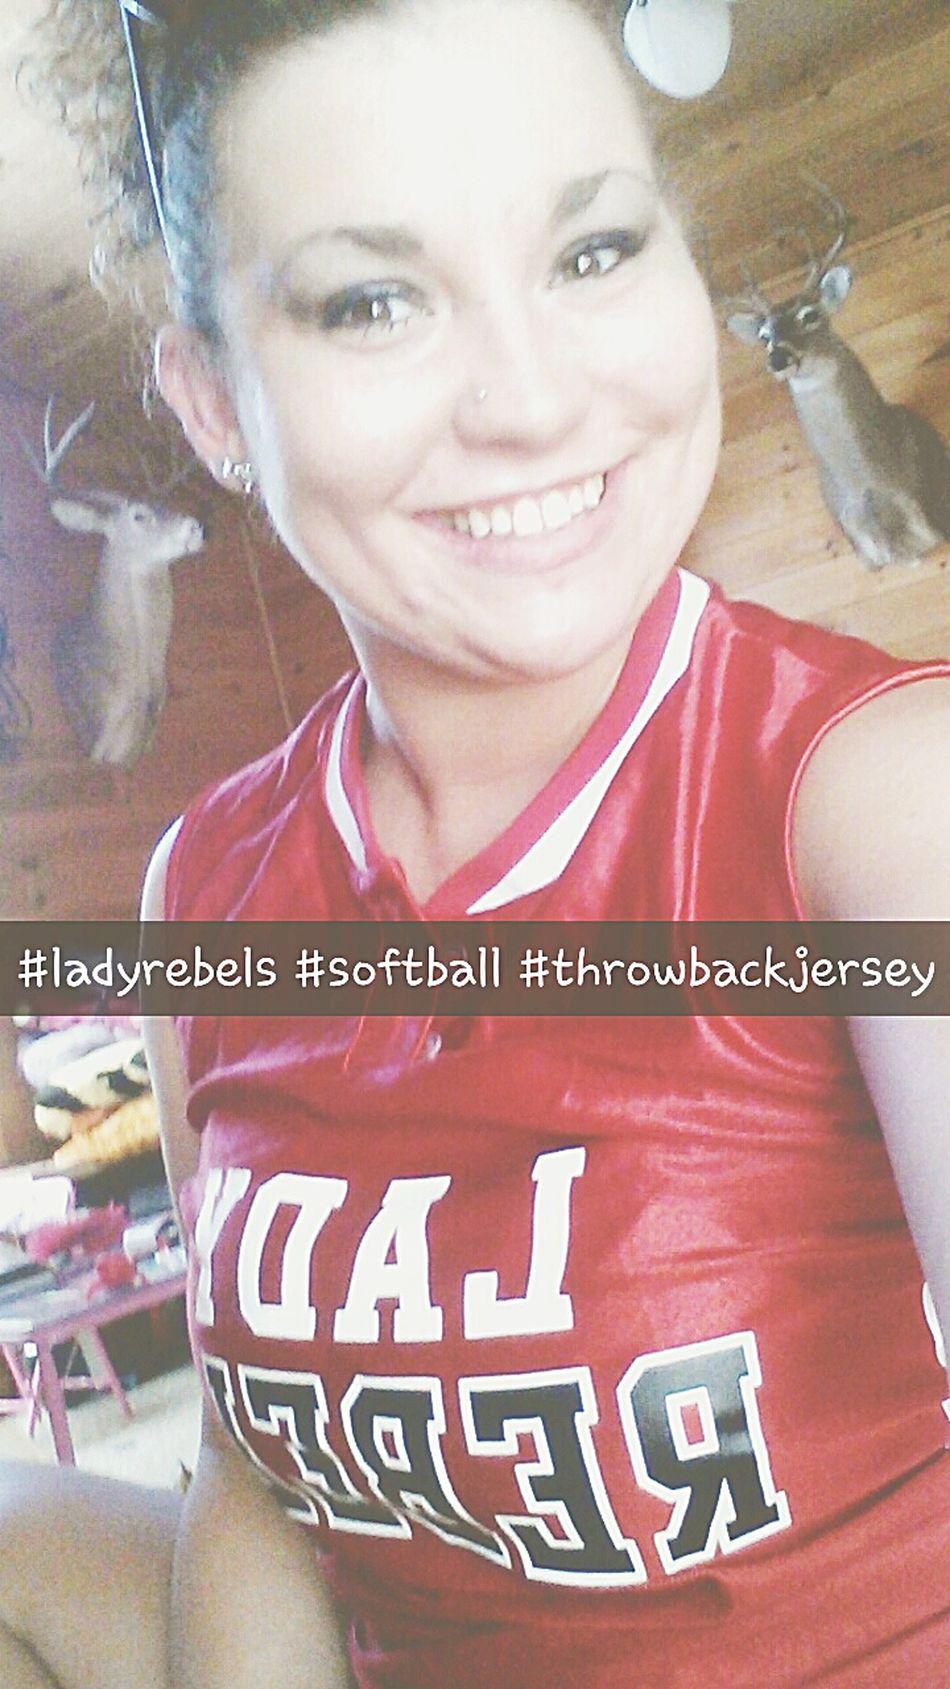 Throwback ✌ jersey Ladyrebels Softball